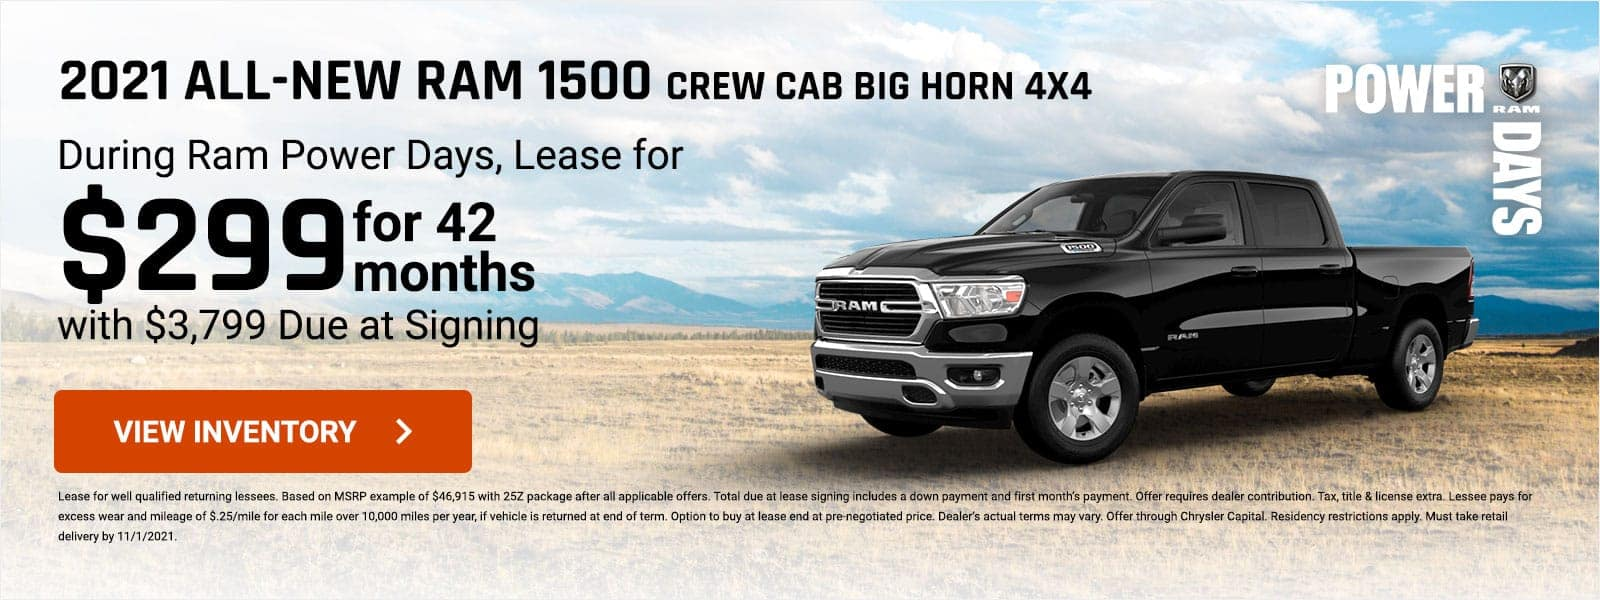 1600x600_2021-10_21_ram_1500_lease